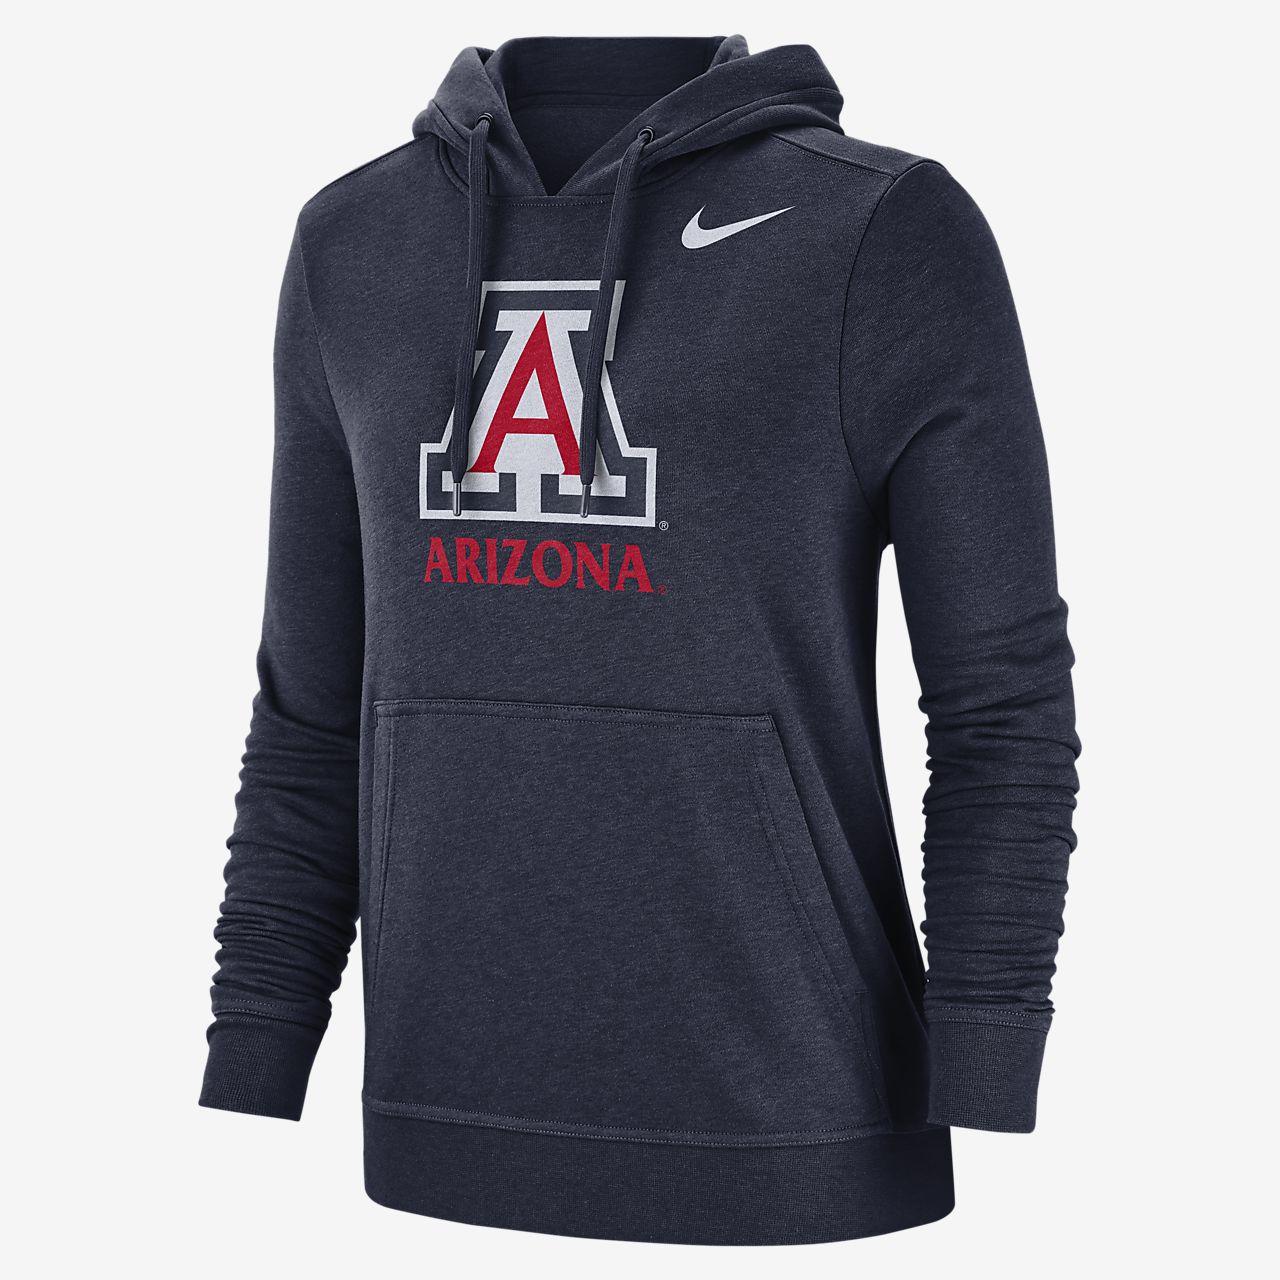 Nike College Club Fleece (Arizona) Women's Pullover Hoodie